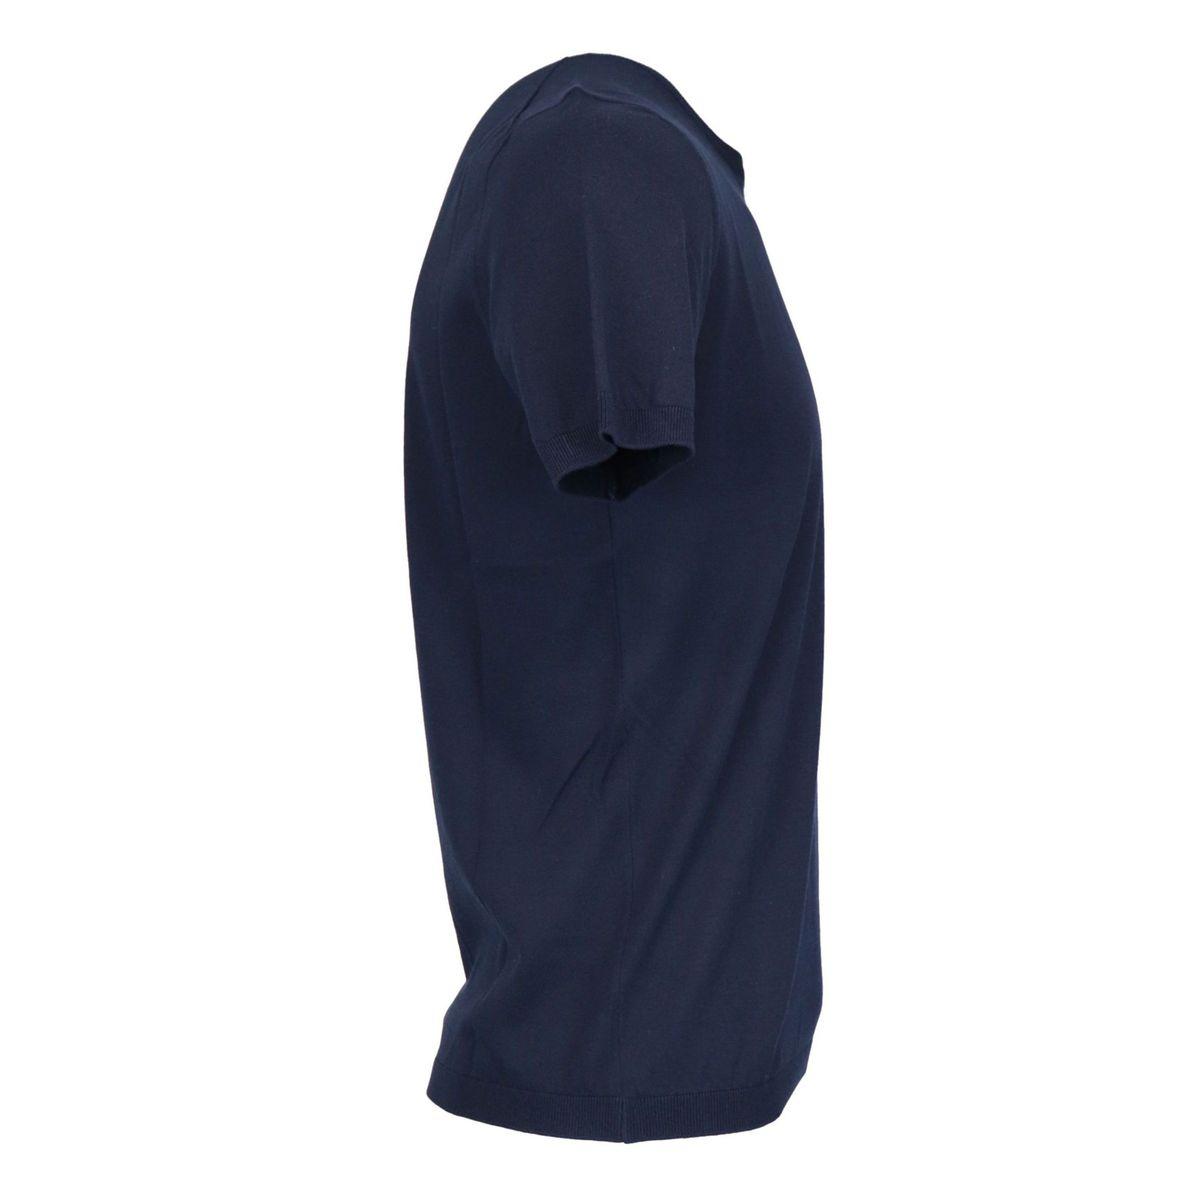 Short-sleeved crew neck sweater in cotton Navy Gran Sasso